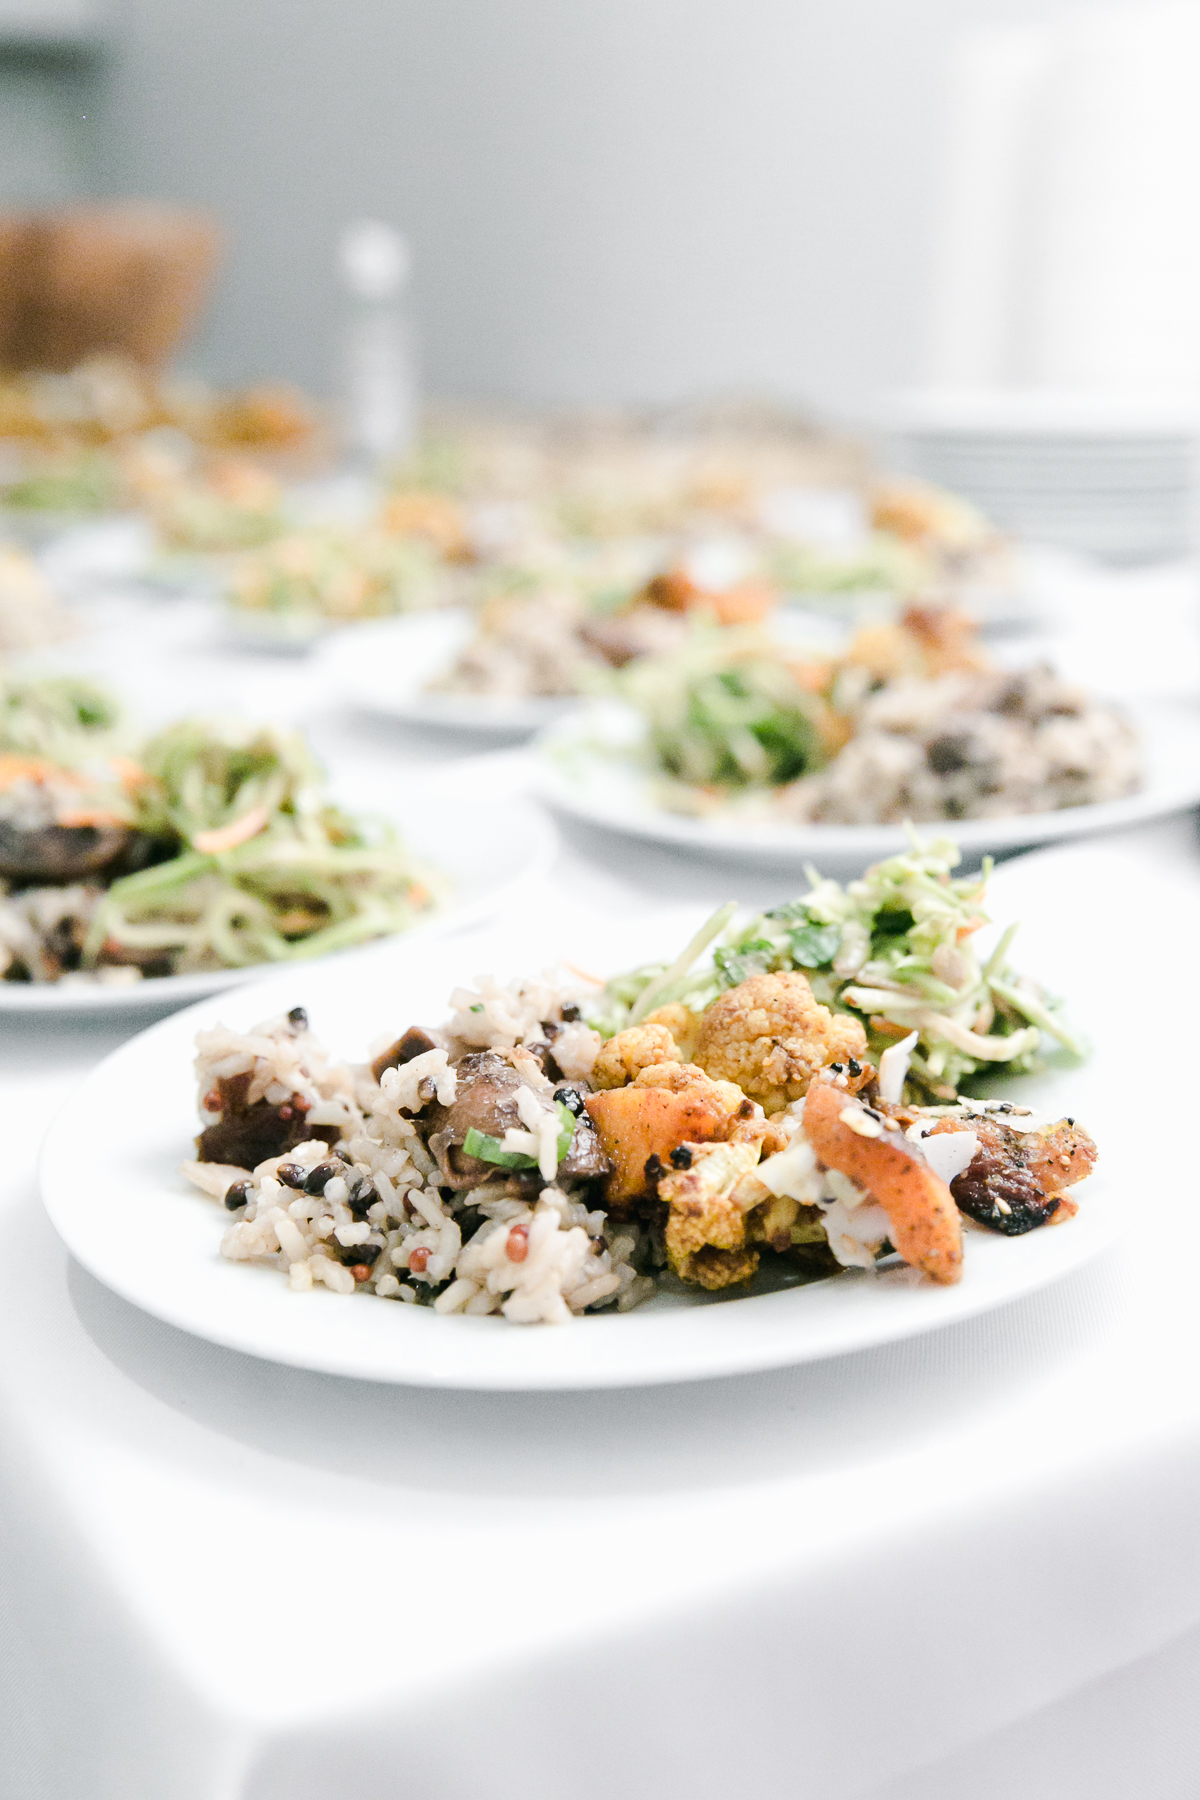 Vegan dishes provided by Carolina Santos Neves  @caroleenanyc